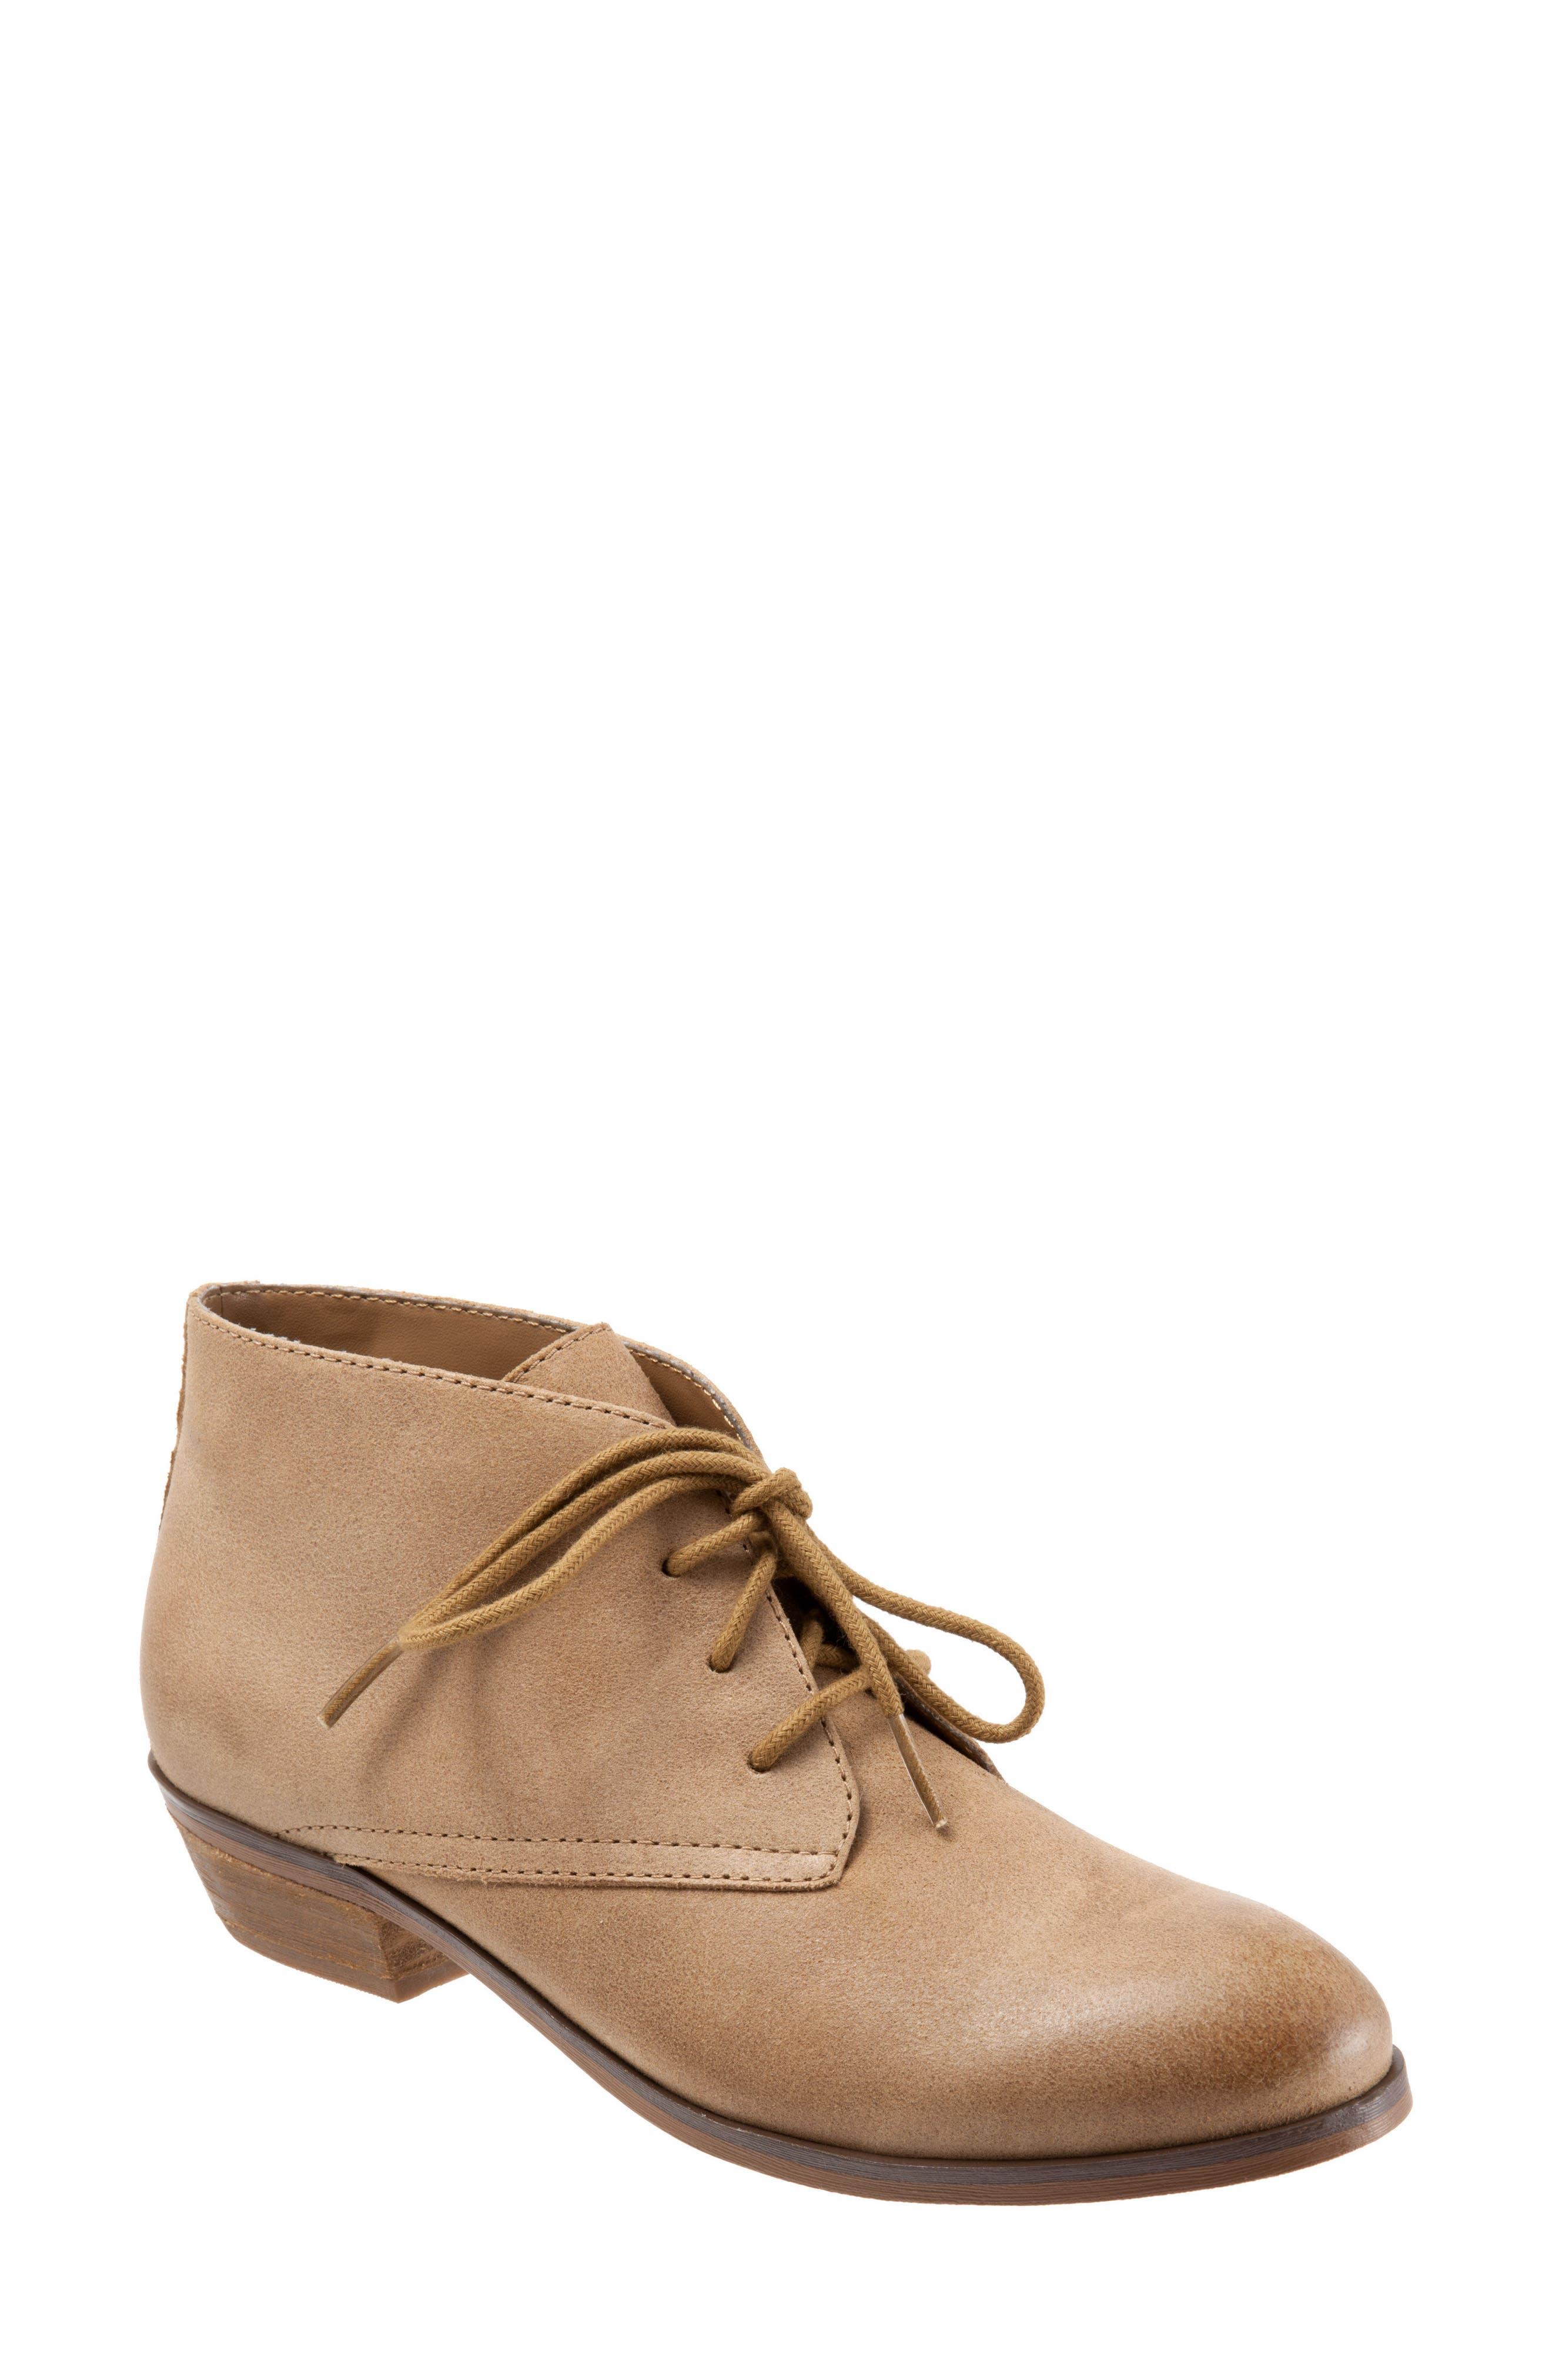 'Ramsey' Chukka Boot,                         Main,                         color, Sand Leather